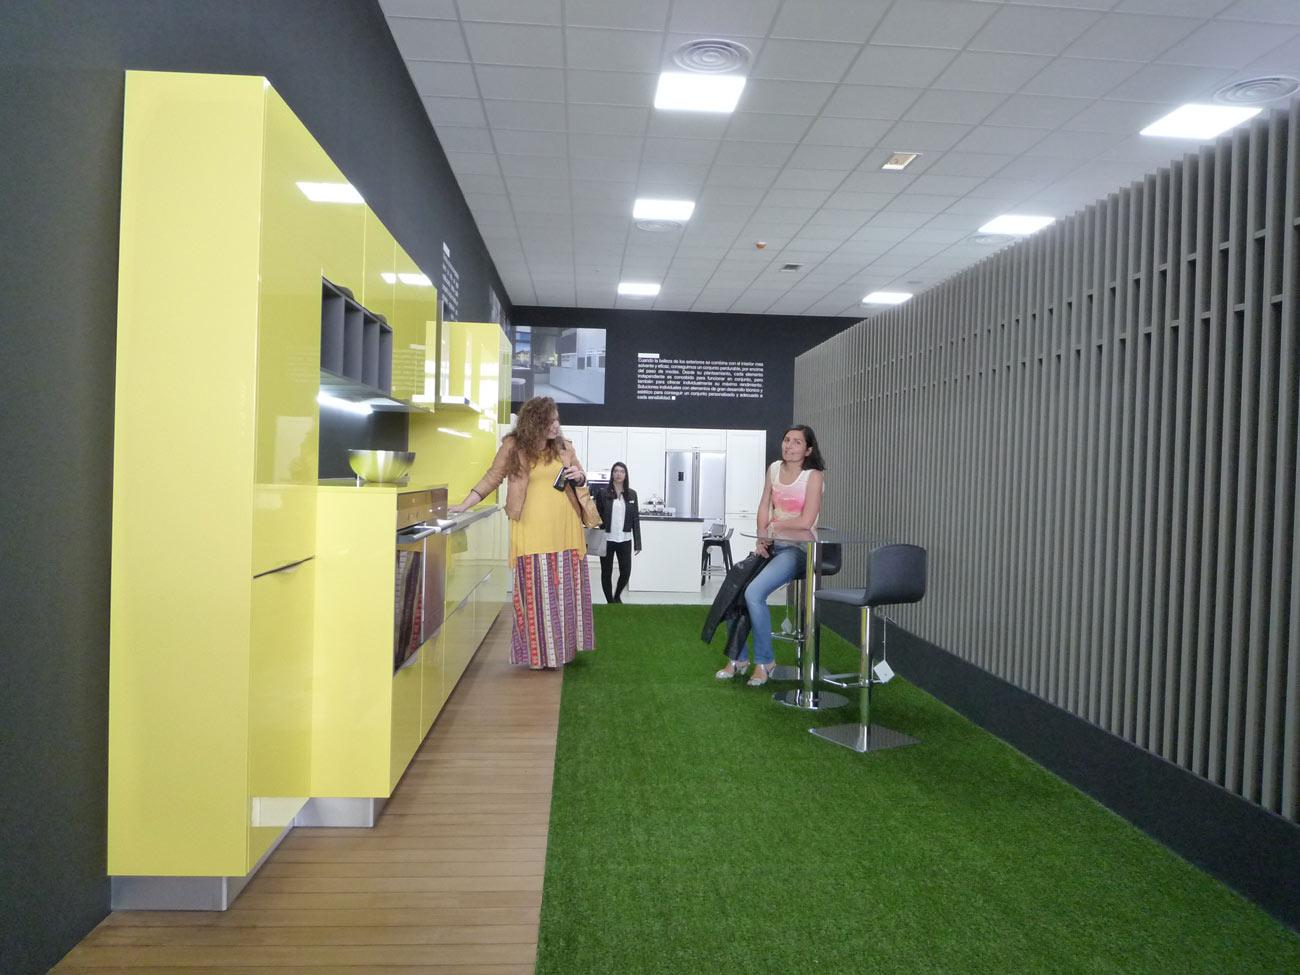 Ilazki Aguirrezábal y Lucía Fernández, alumnas de diseño de ...